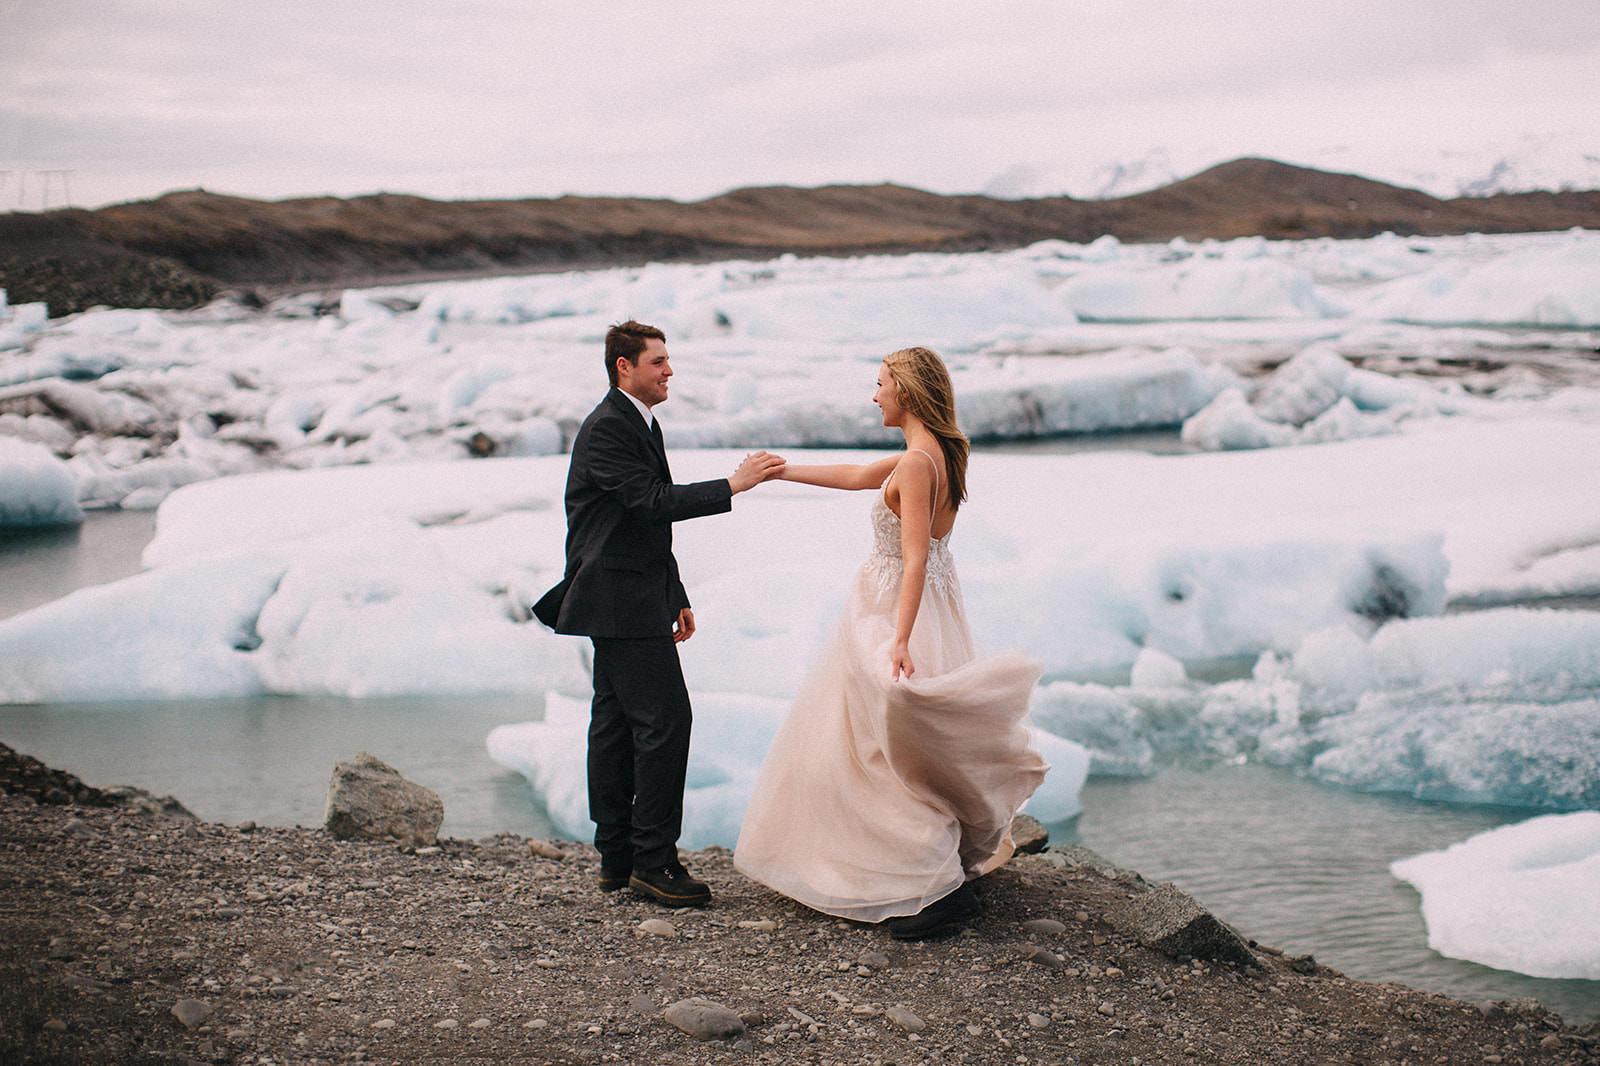 Icelandic Iceland Elopement Wedding Elope Photographer Eloping Reykjavík Vik Black Sand Beach Jökulsárlón Skogafoss Waterfall Vestrahorn Mountain Liz Osban Photography Destination 52.jpg